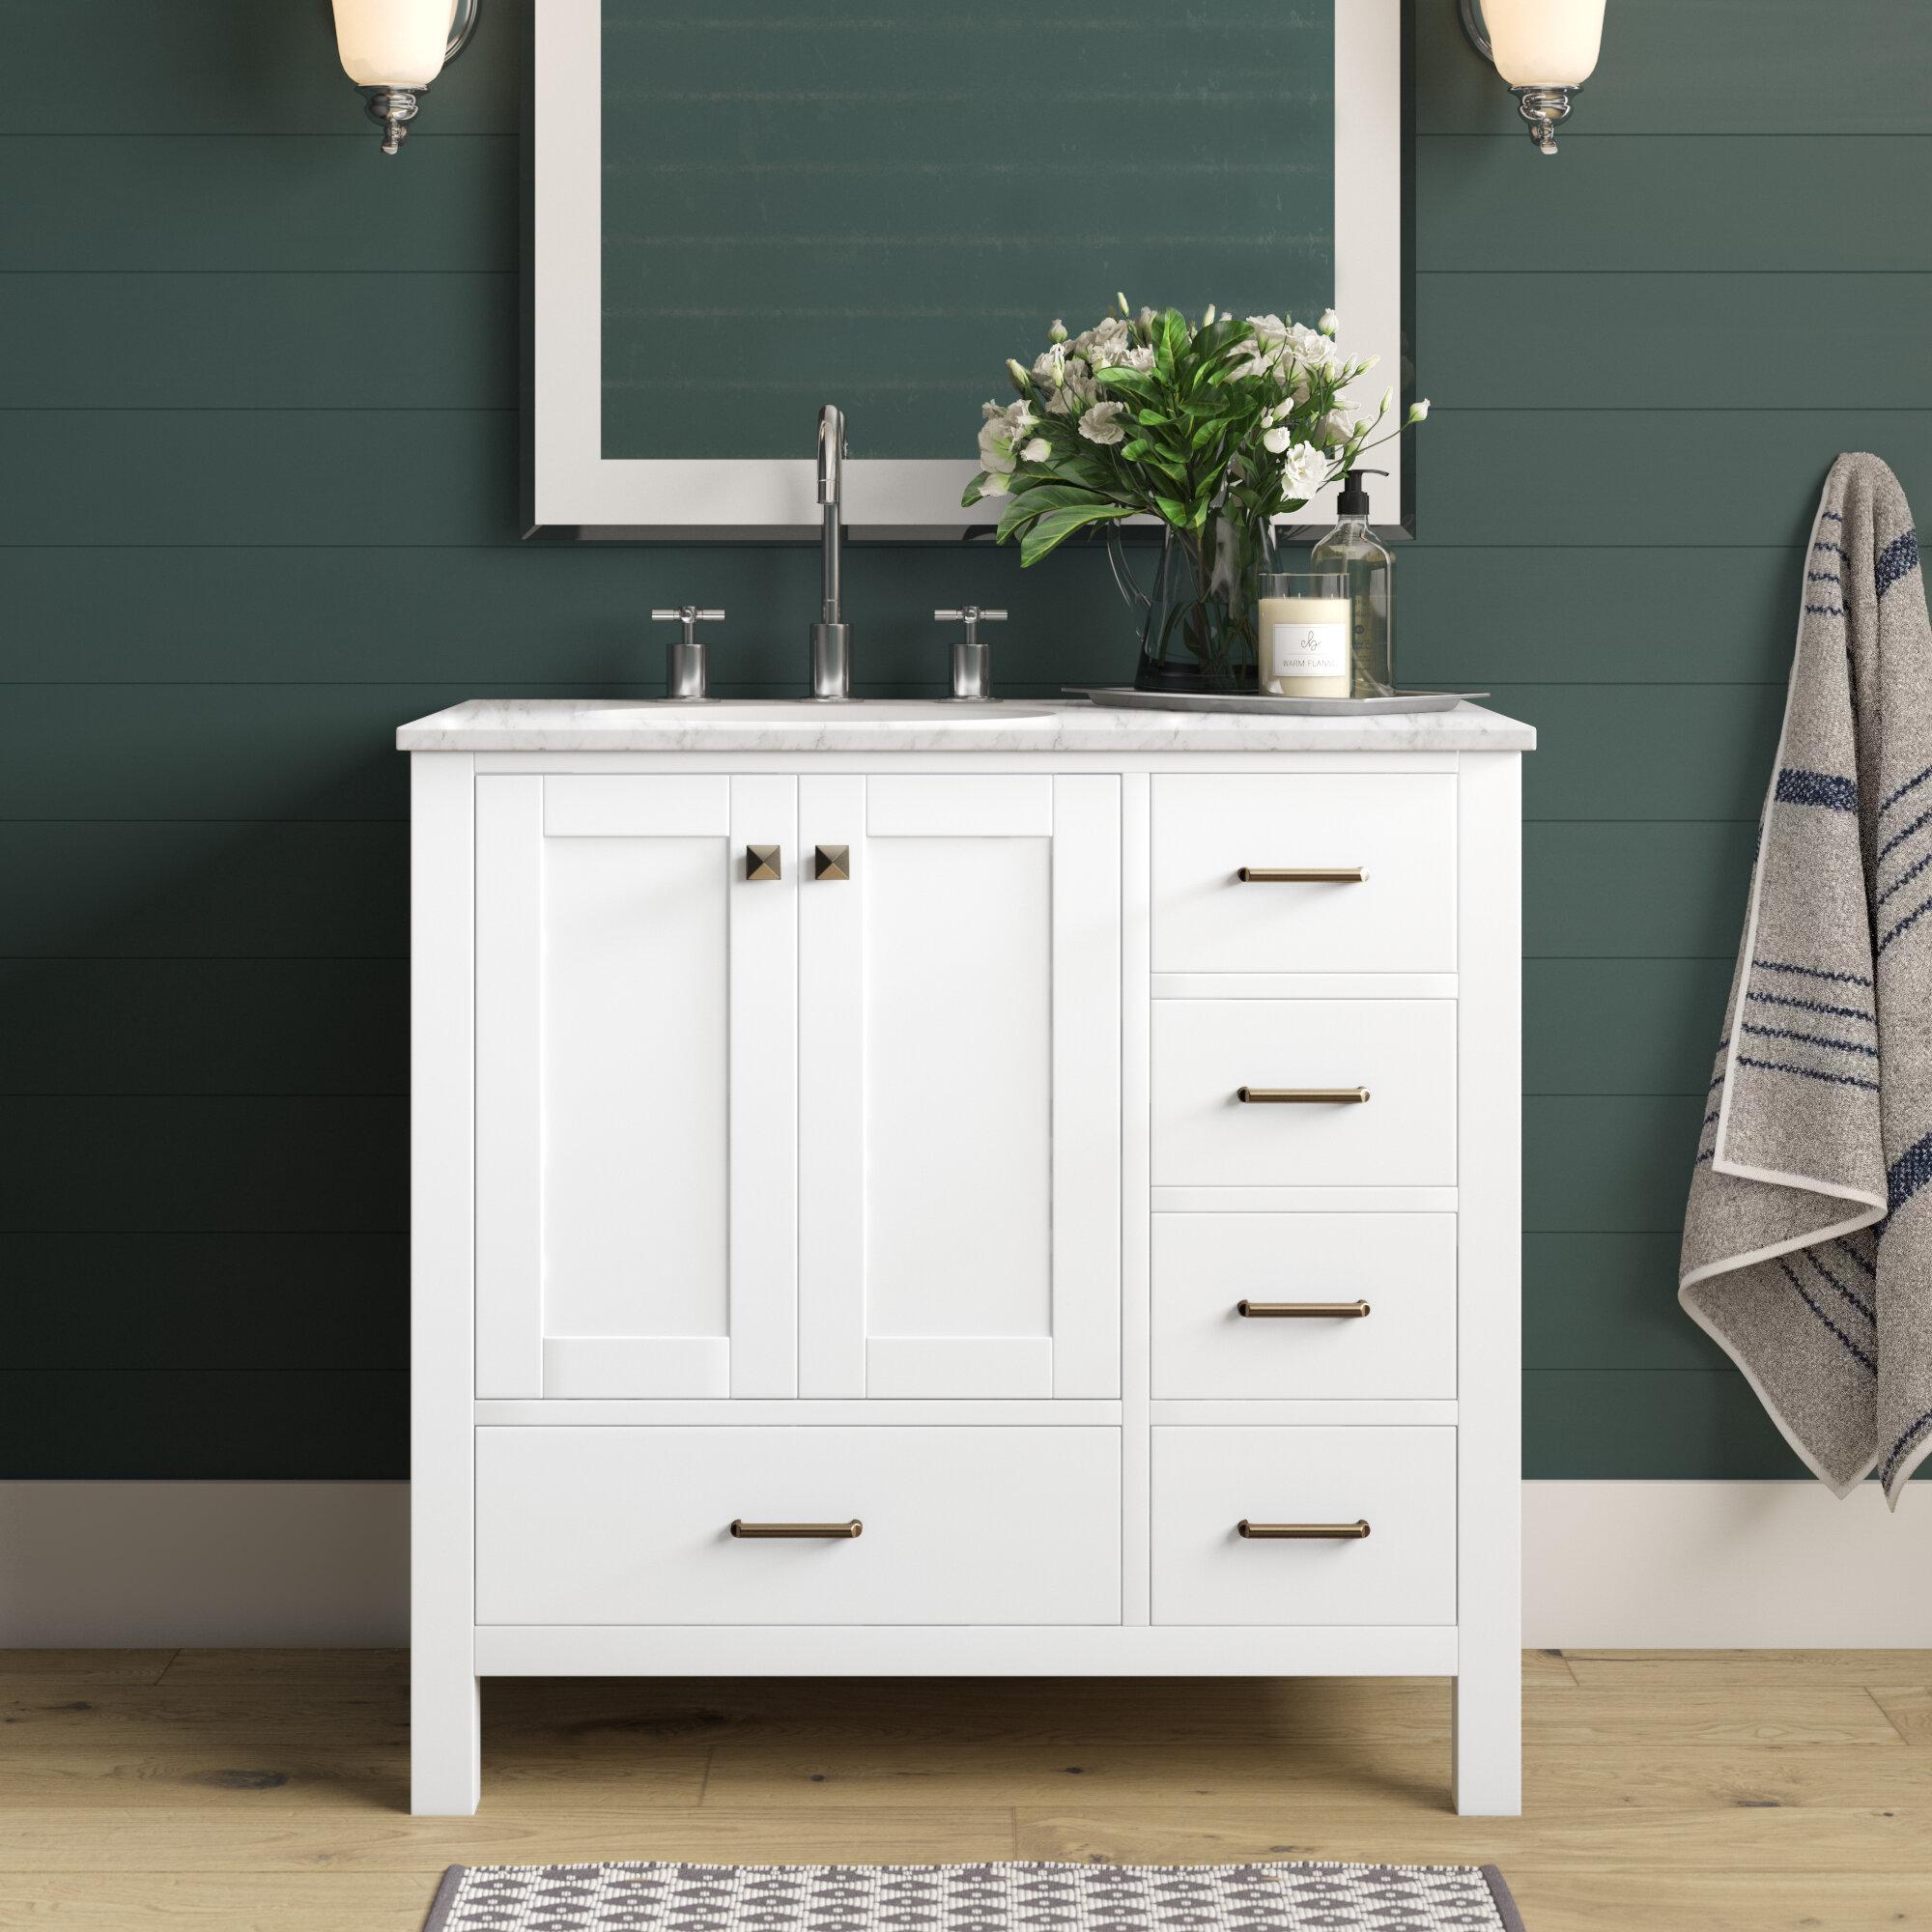 Aneira Full Cabinet 36 Single Bathroom Vanity Set Reviews Joss Main